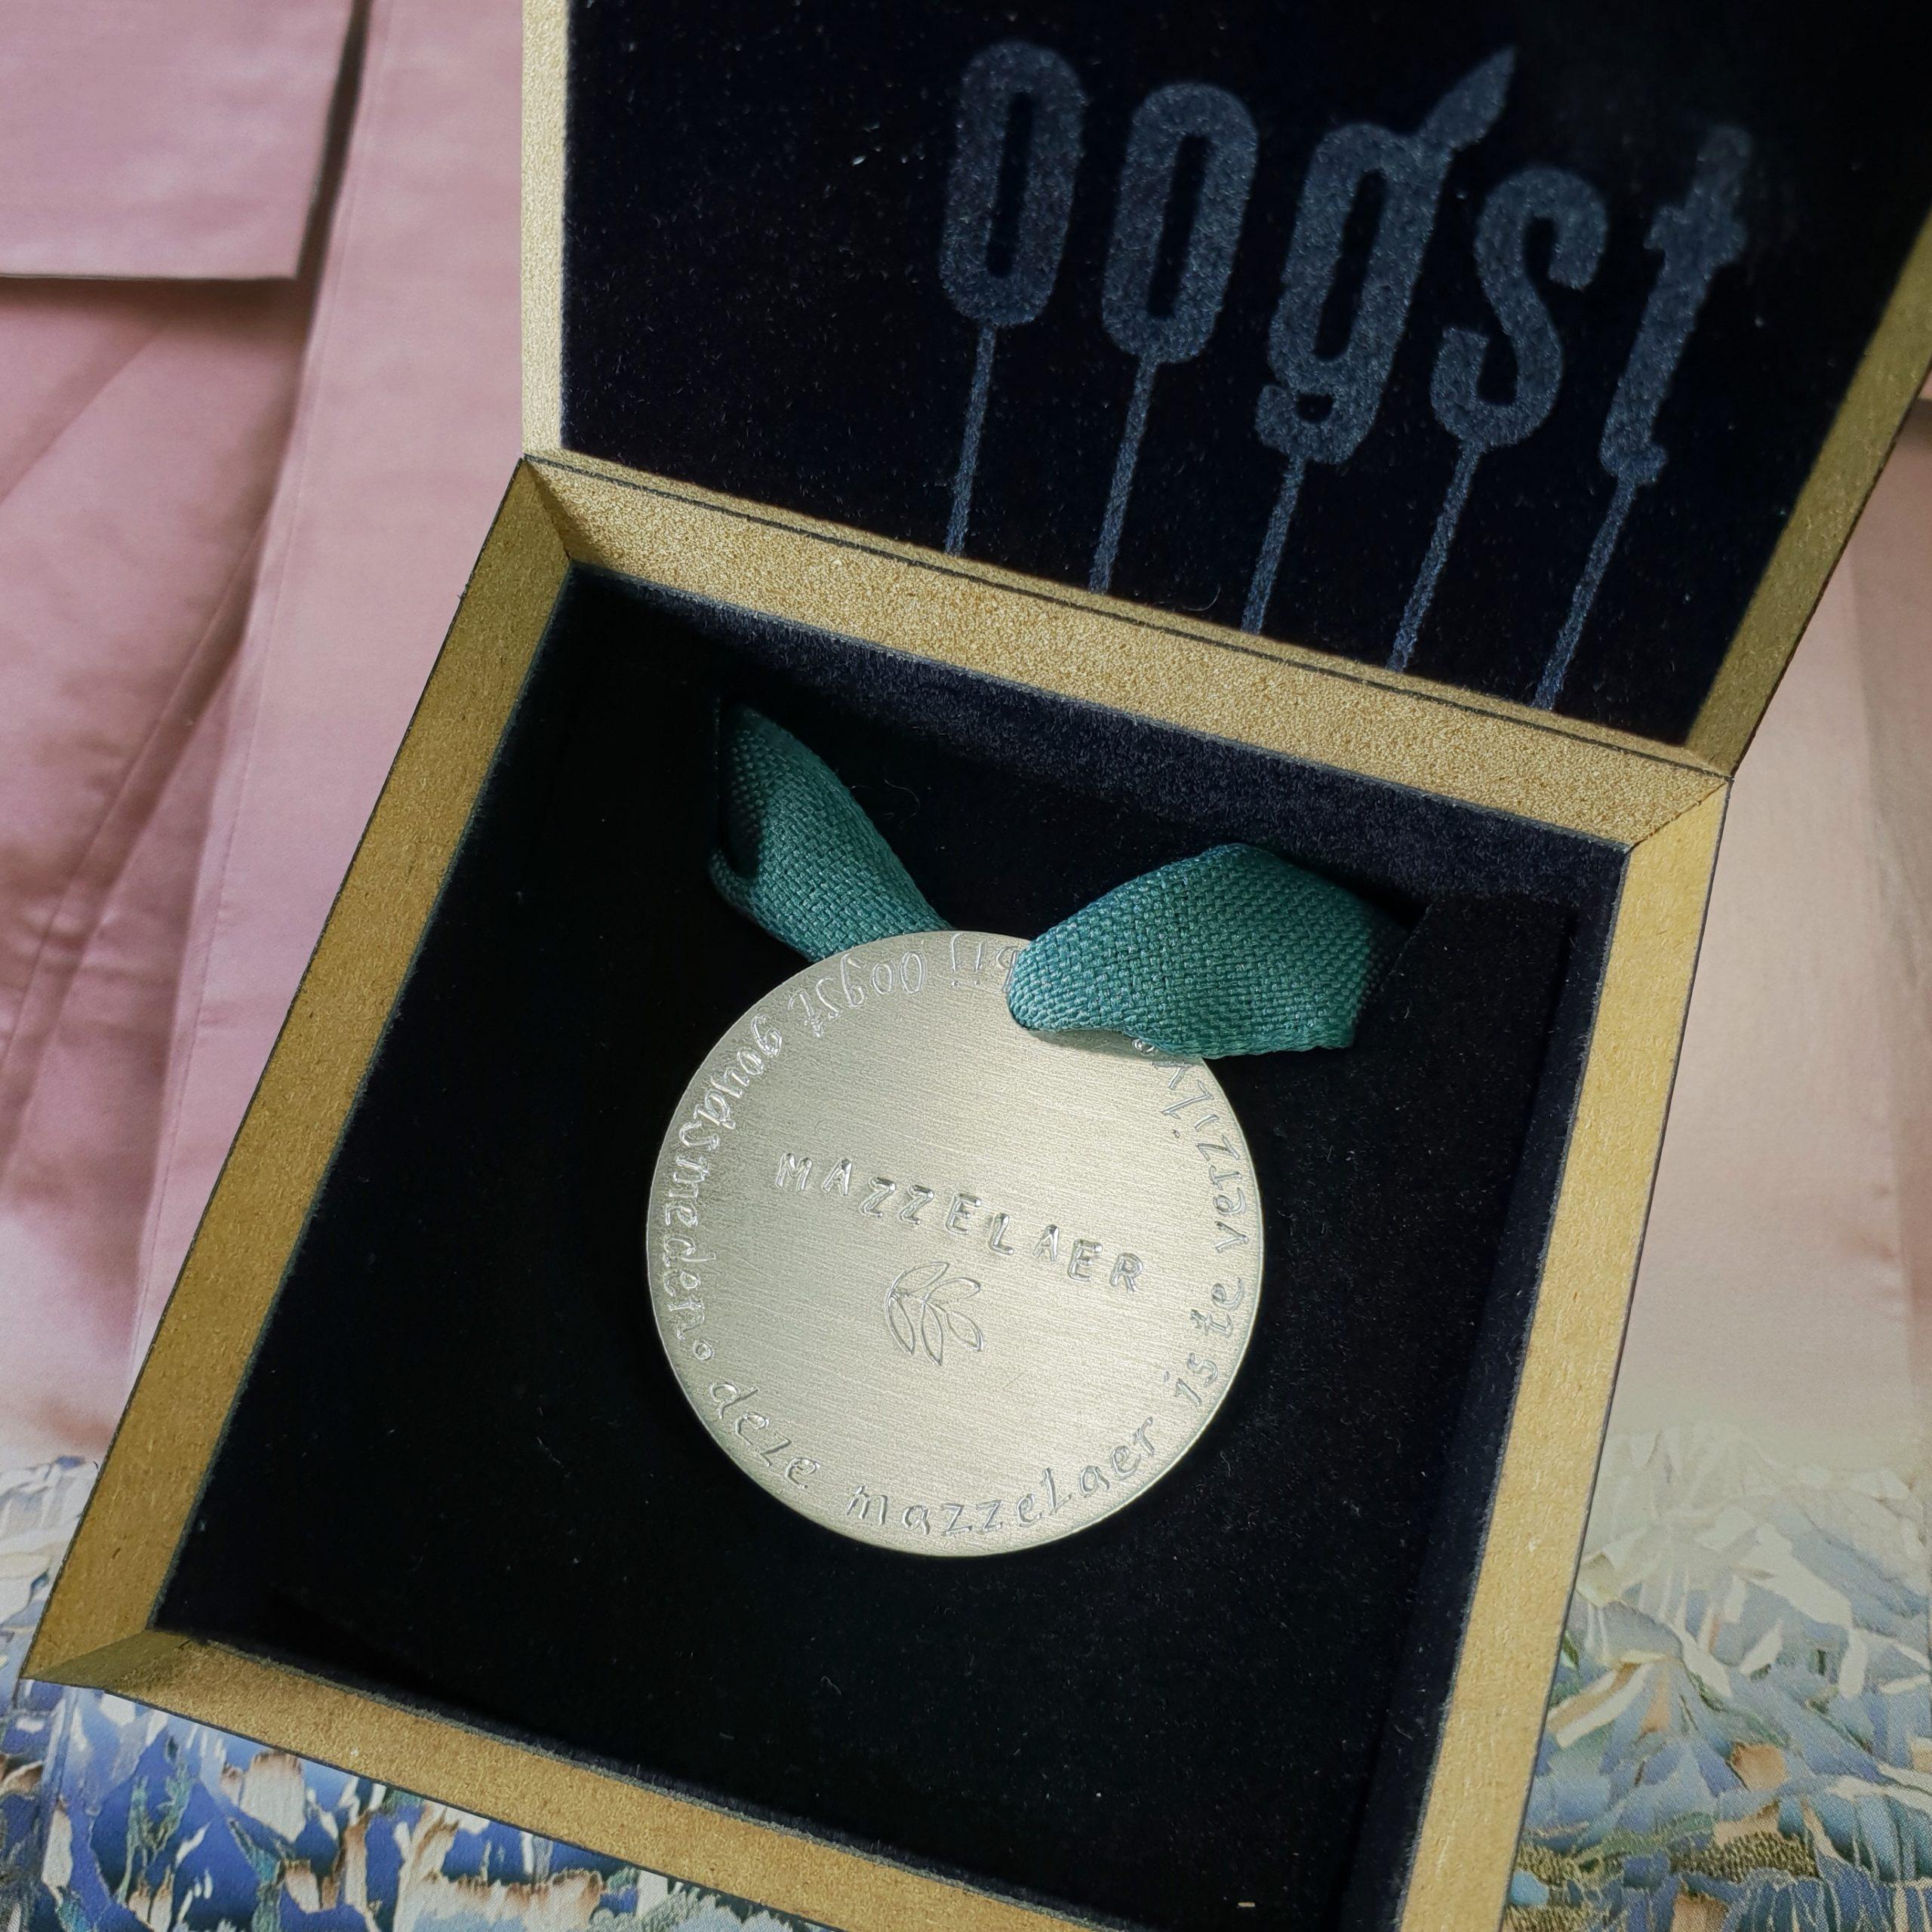 De mazzelaer - Oogst Cadeaubon. The Oogst gift certificate.